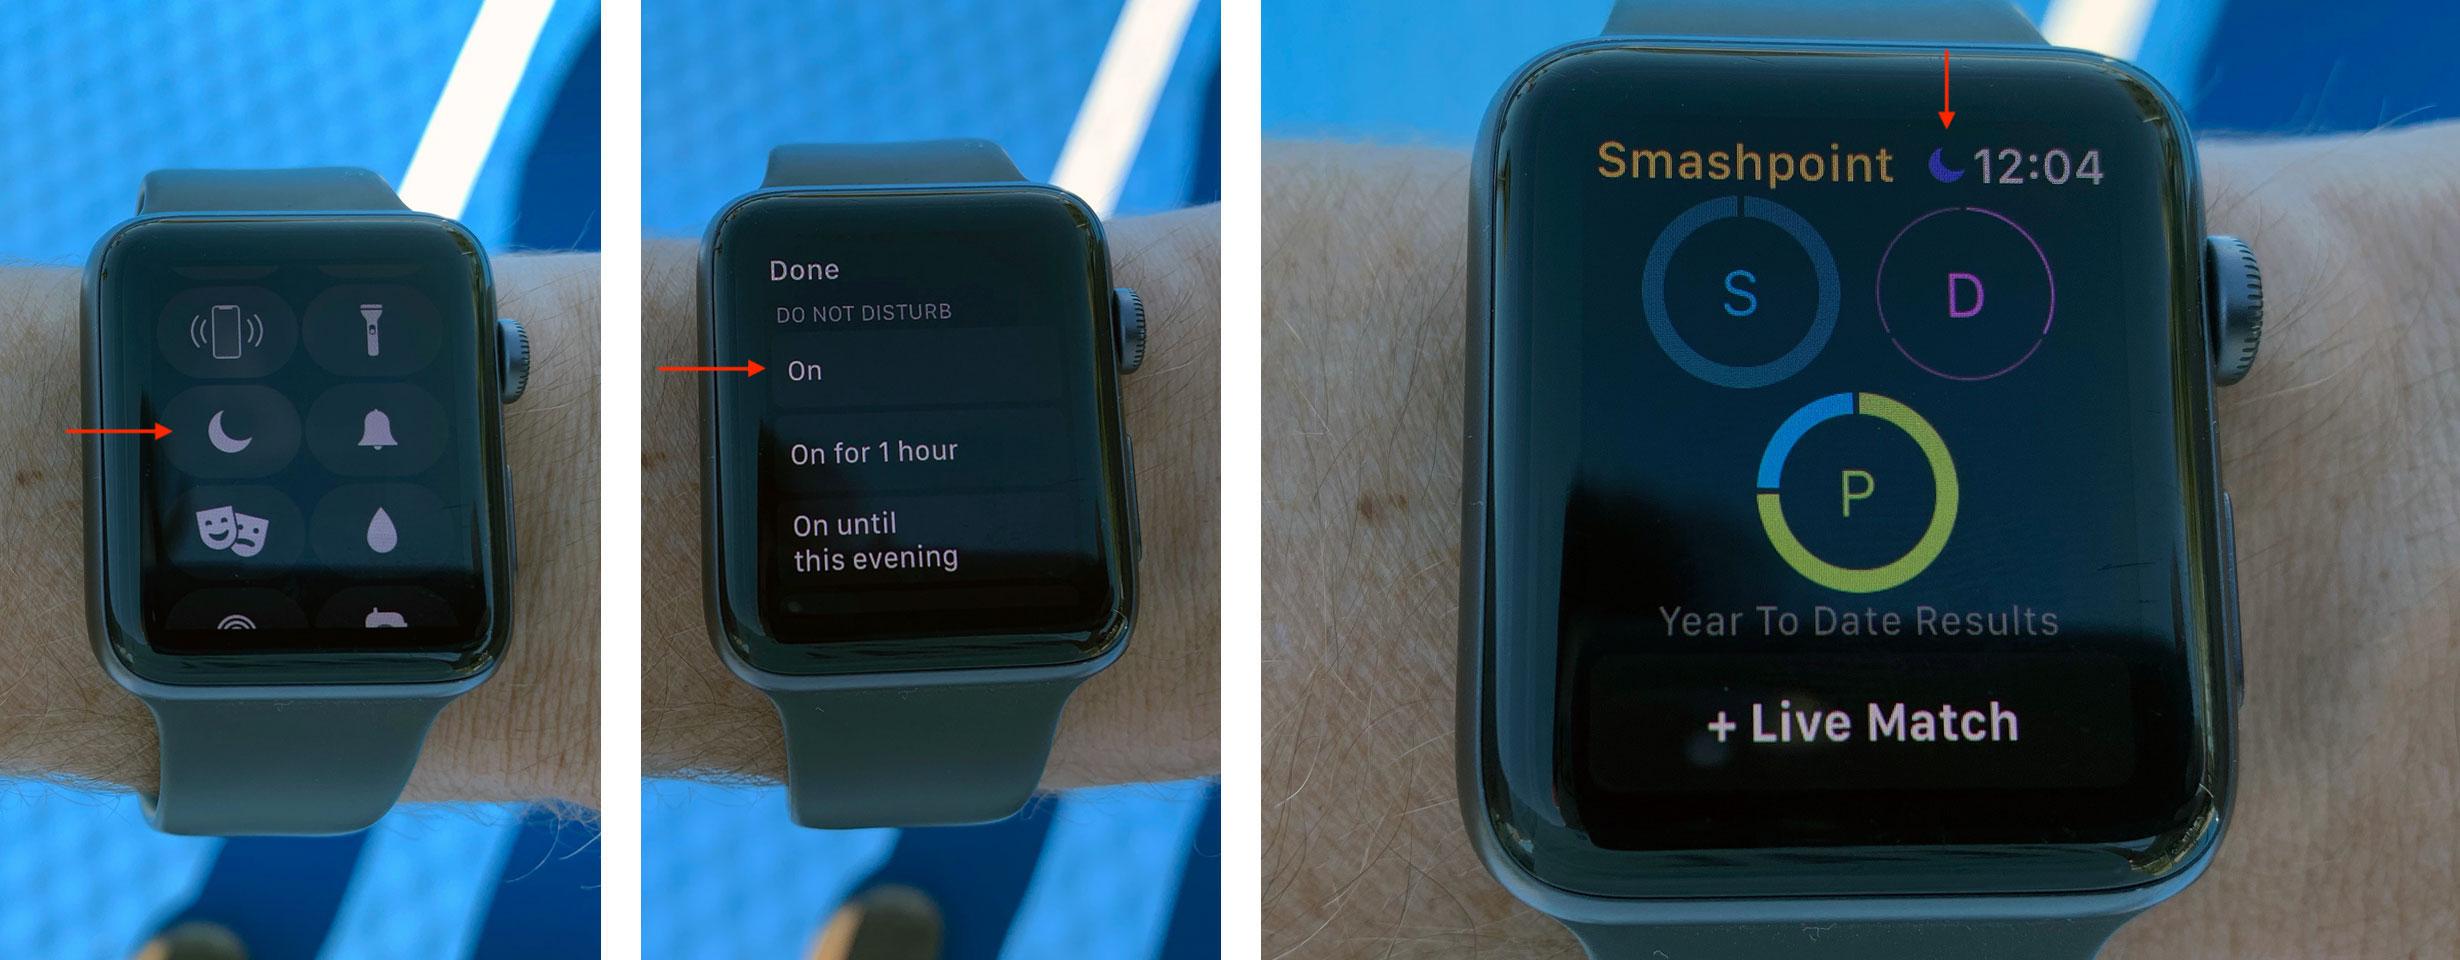 Apple Watch - Do Not Disturb